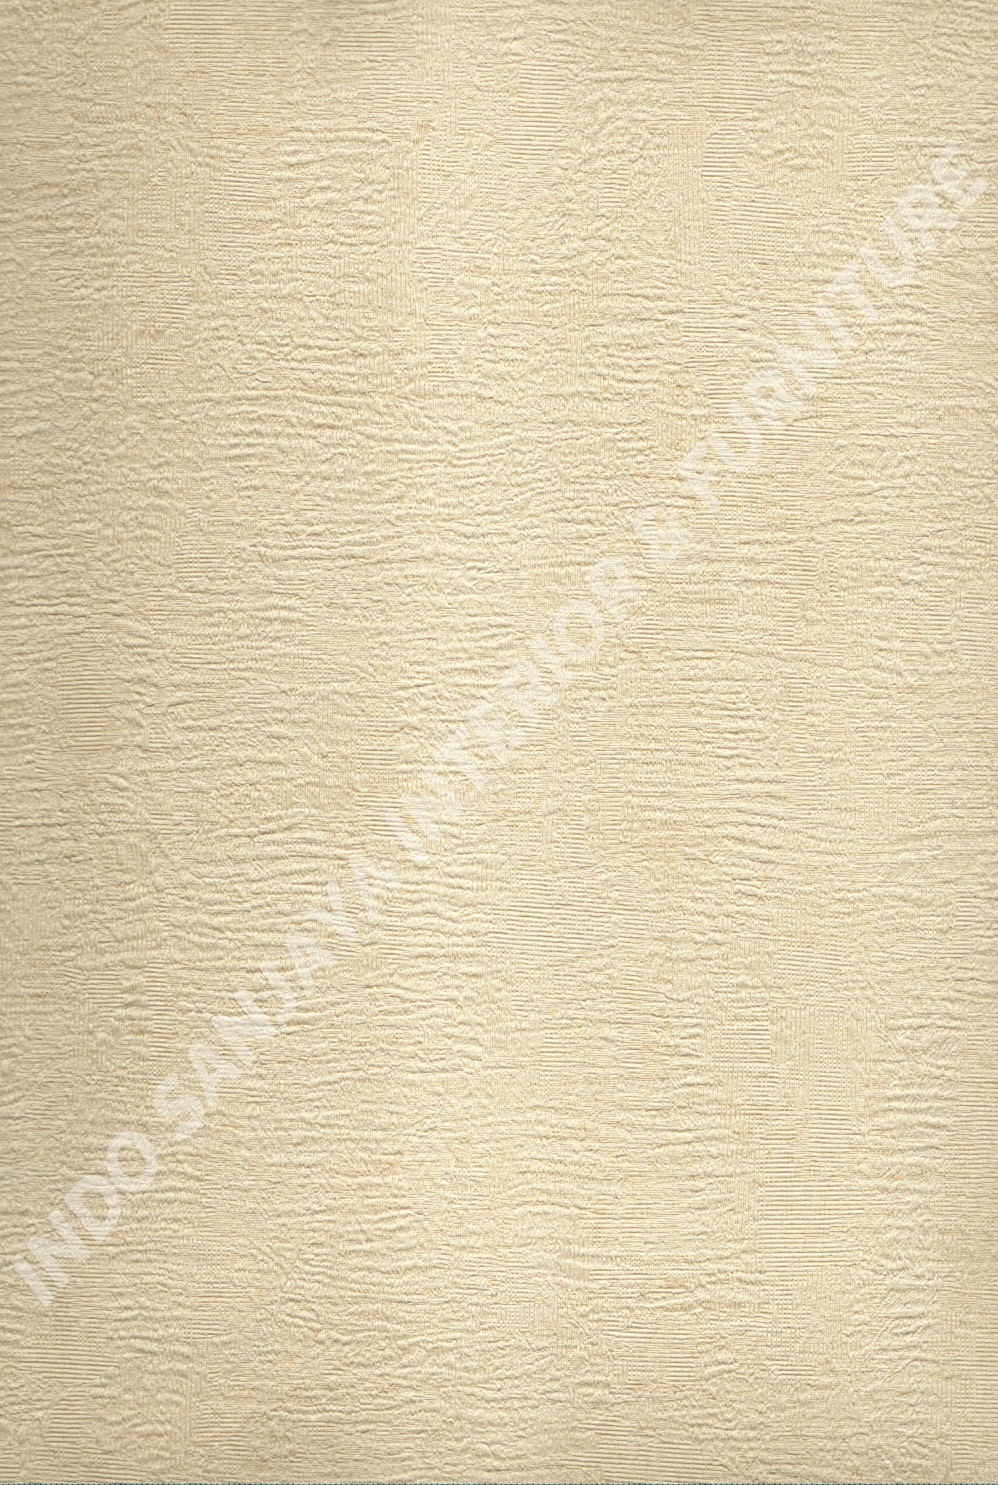 wallpaper   Wallpaper Minimalis Polos 51014-1:51014-1 corak  warna